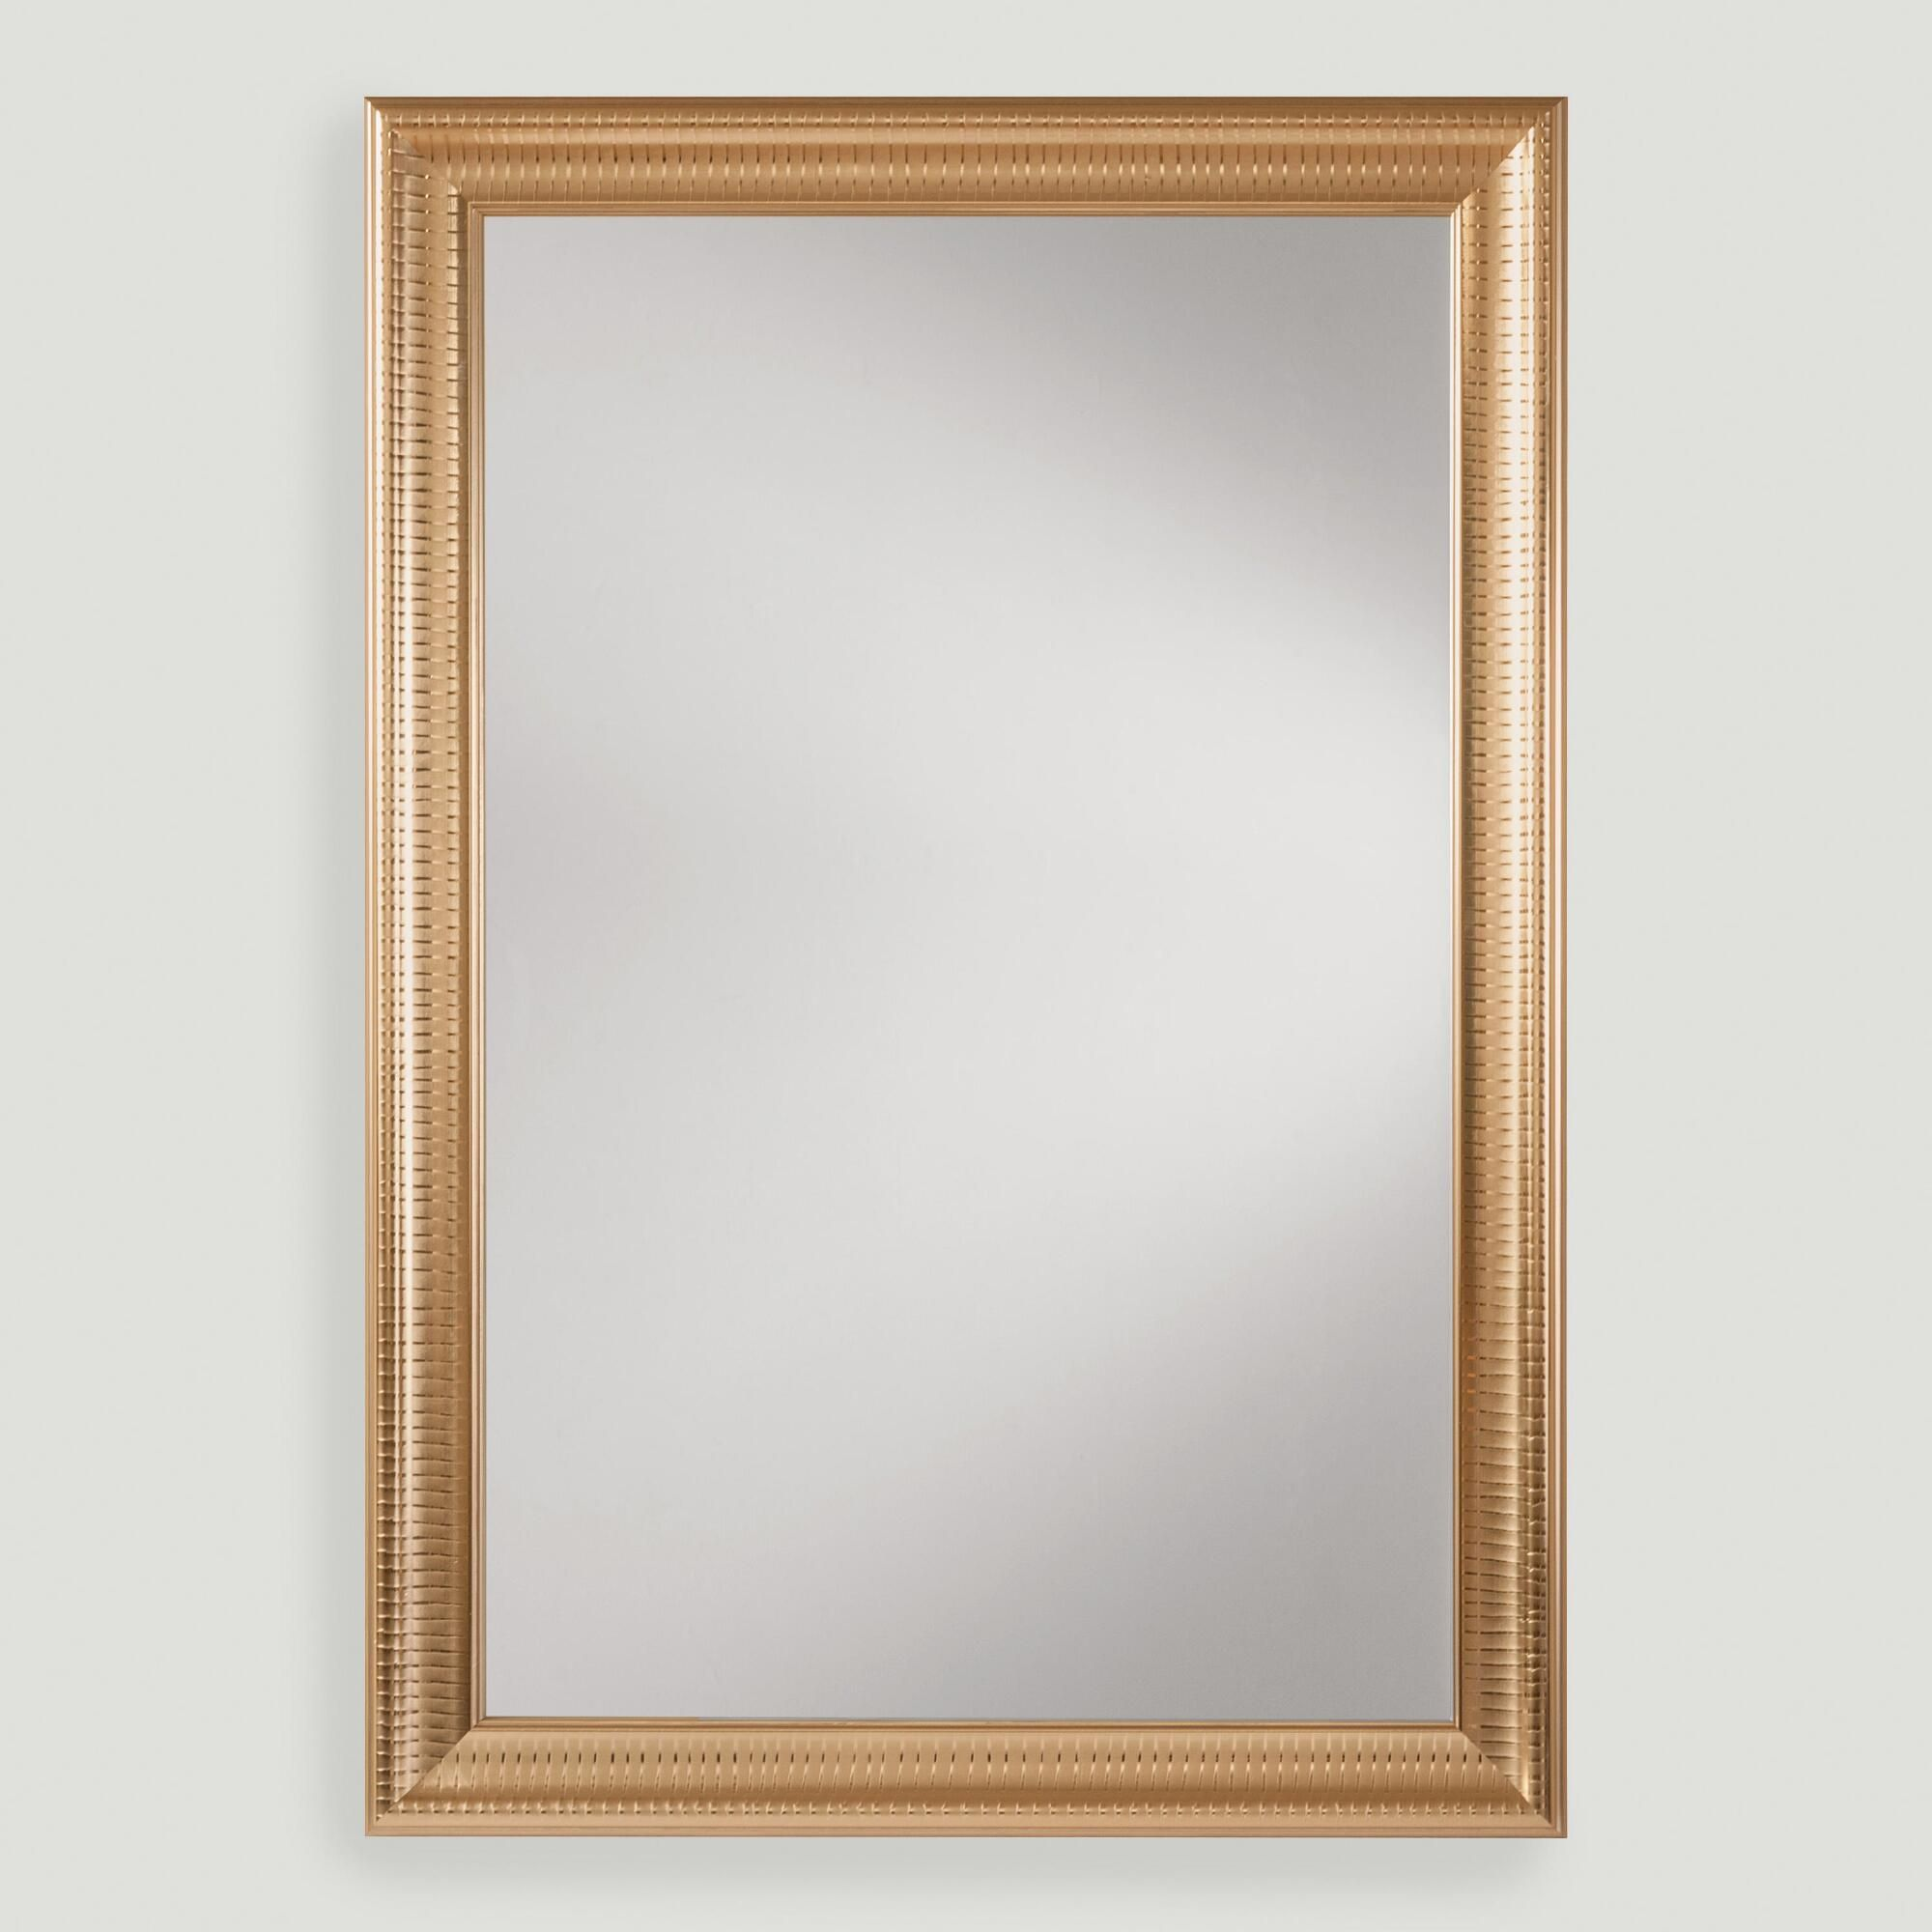 Gold Metal Framed Rectangular Mirror Framed Mirror Wall Gold Mirror Wall Mirror Wall